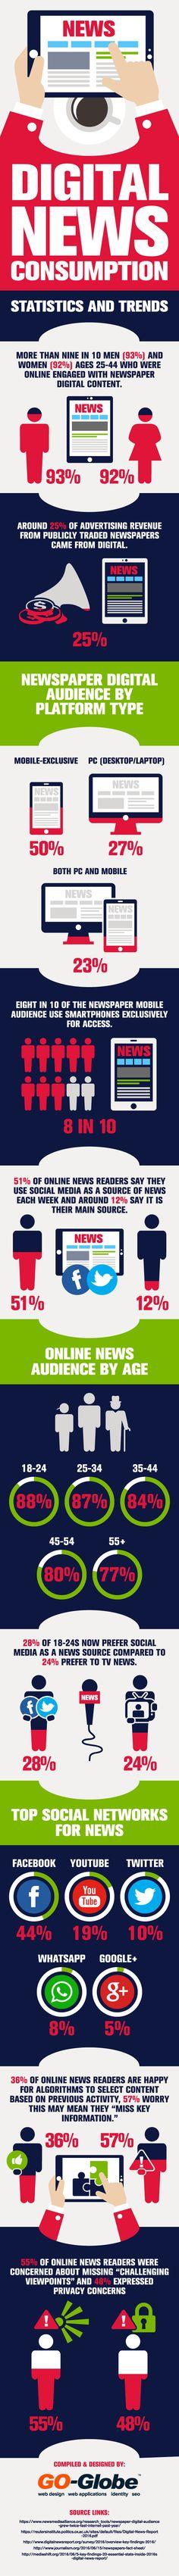 Digital News Consumption #Infographic #DigitalMedia #Trends